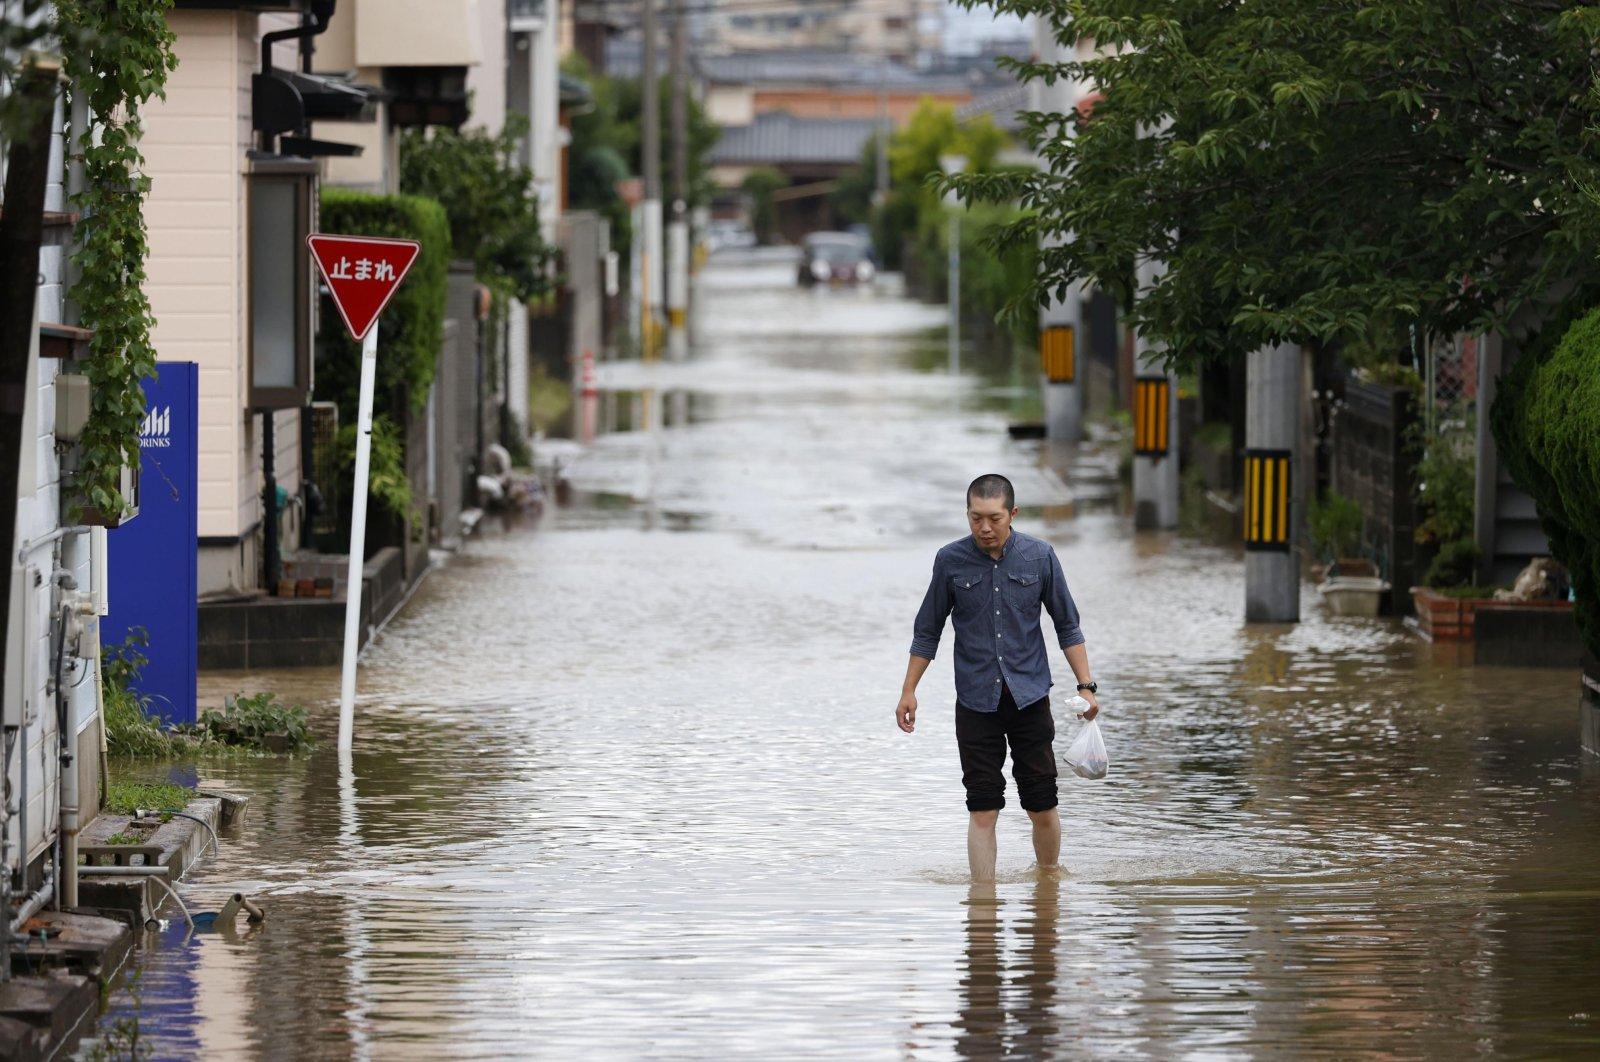 A man walks through a flooded road following heavy rain in Omuta, Fukuoka prefecture, southern Japan Tuesday, July 7, 2020. Floodwaters flowed down streets in southern Japanese towns hit by heavy rains. (Juntaro Yokoyama/Kyodo News via AP)